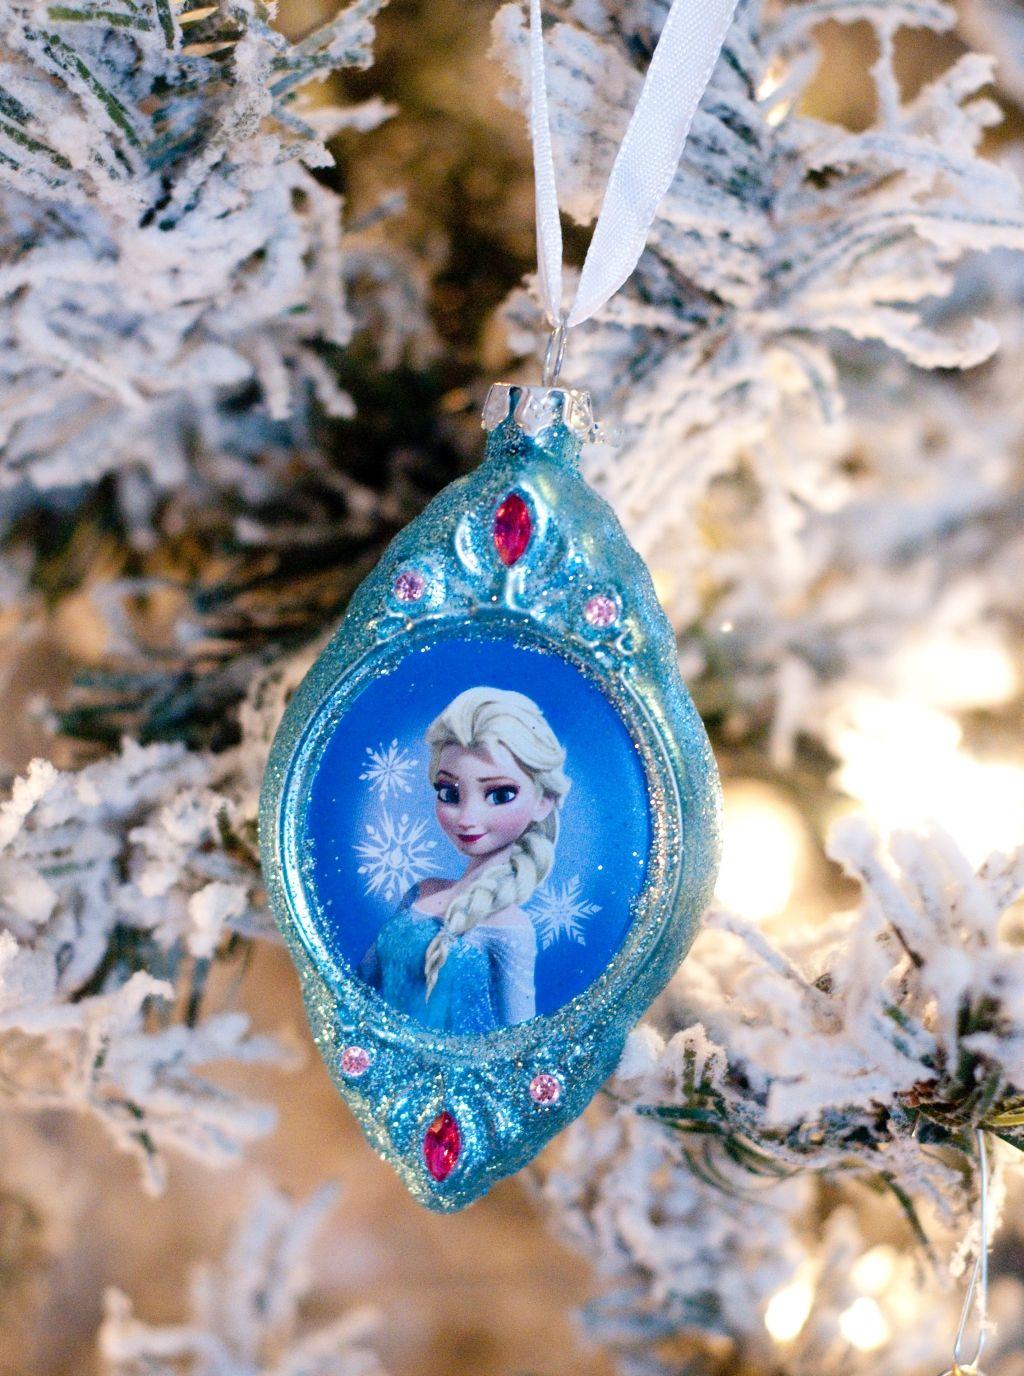 frozen ornament kohls frozen christmas tree pinterest jpg 1024x1376 kohls christmas ornaments